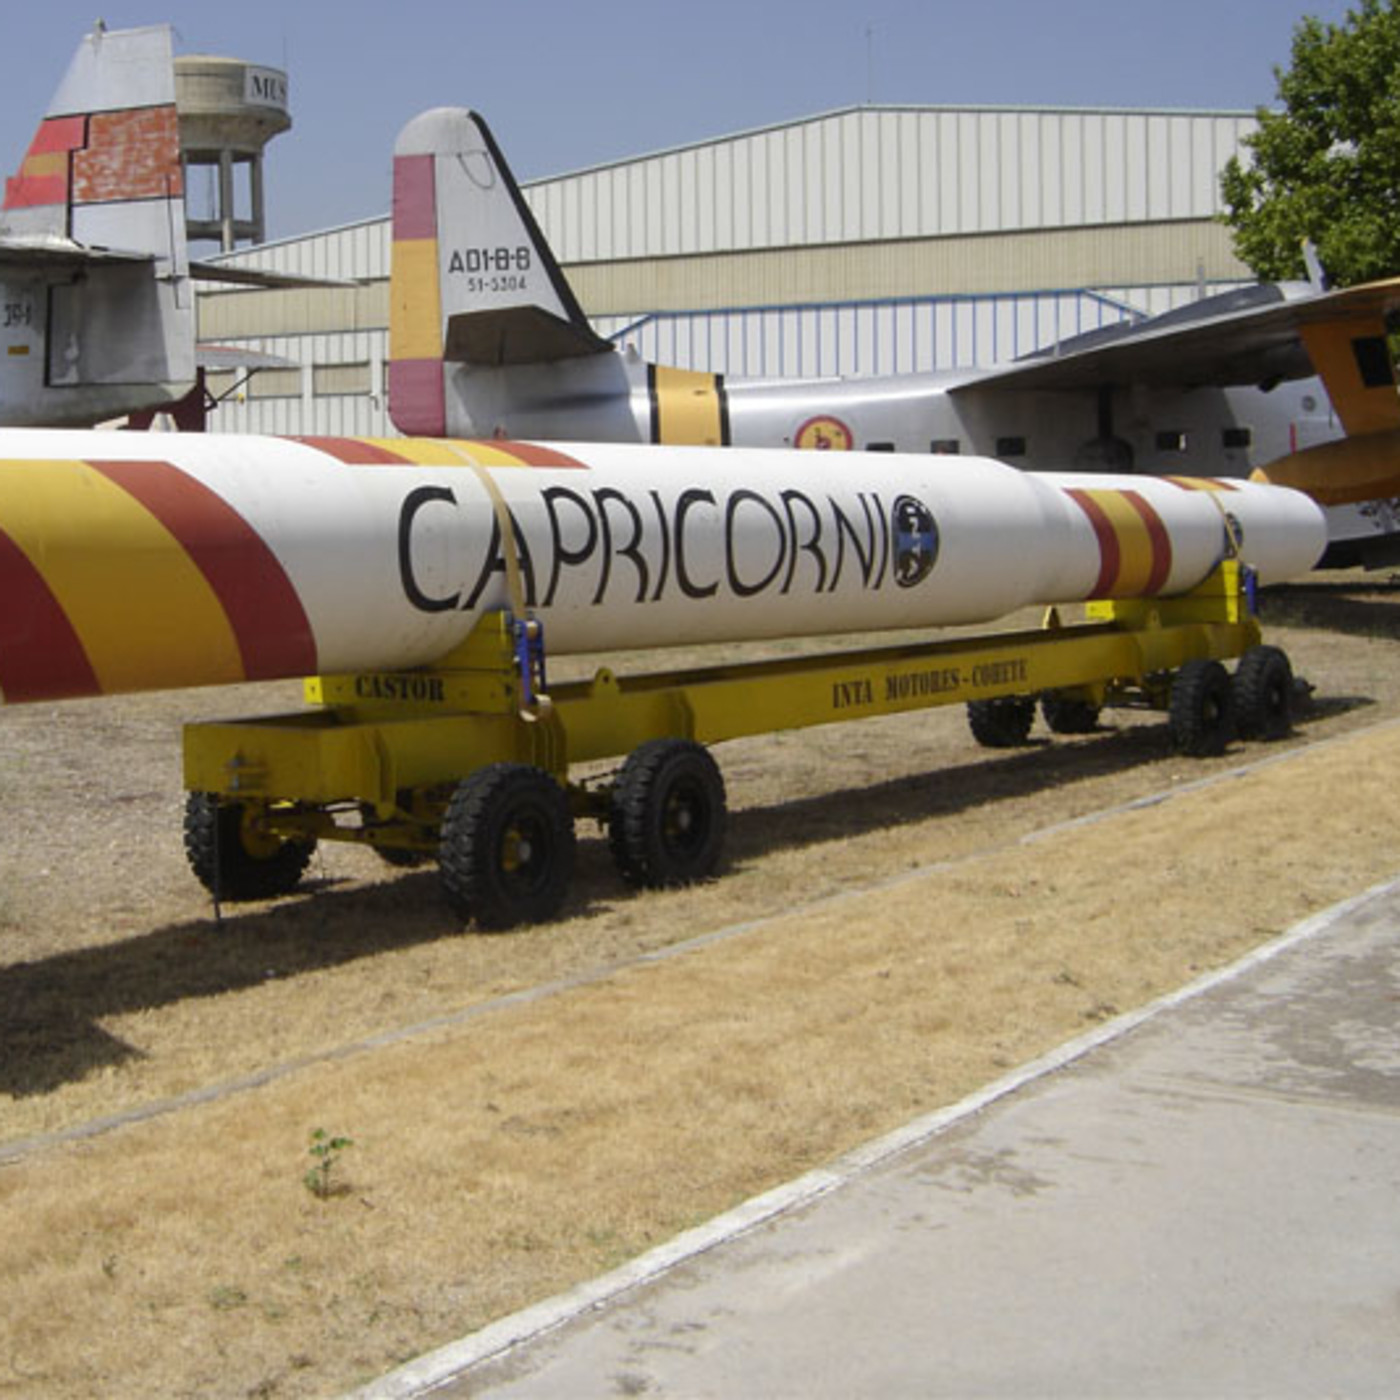 Sustos nucleares, misiles, satélites y geoestrategia...